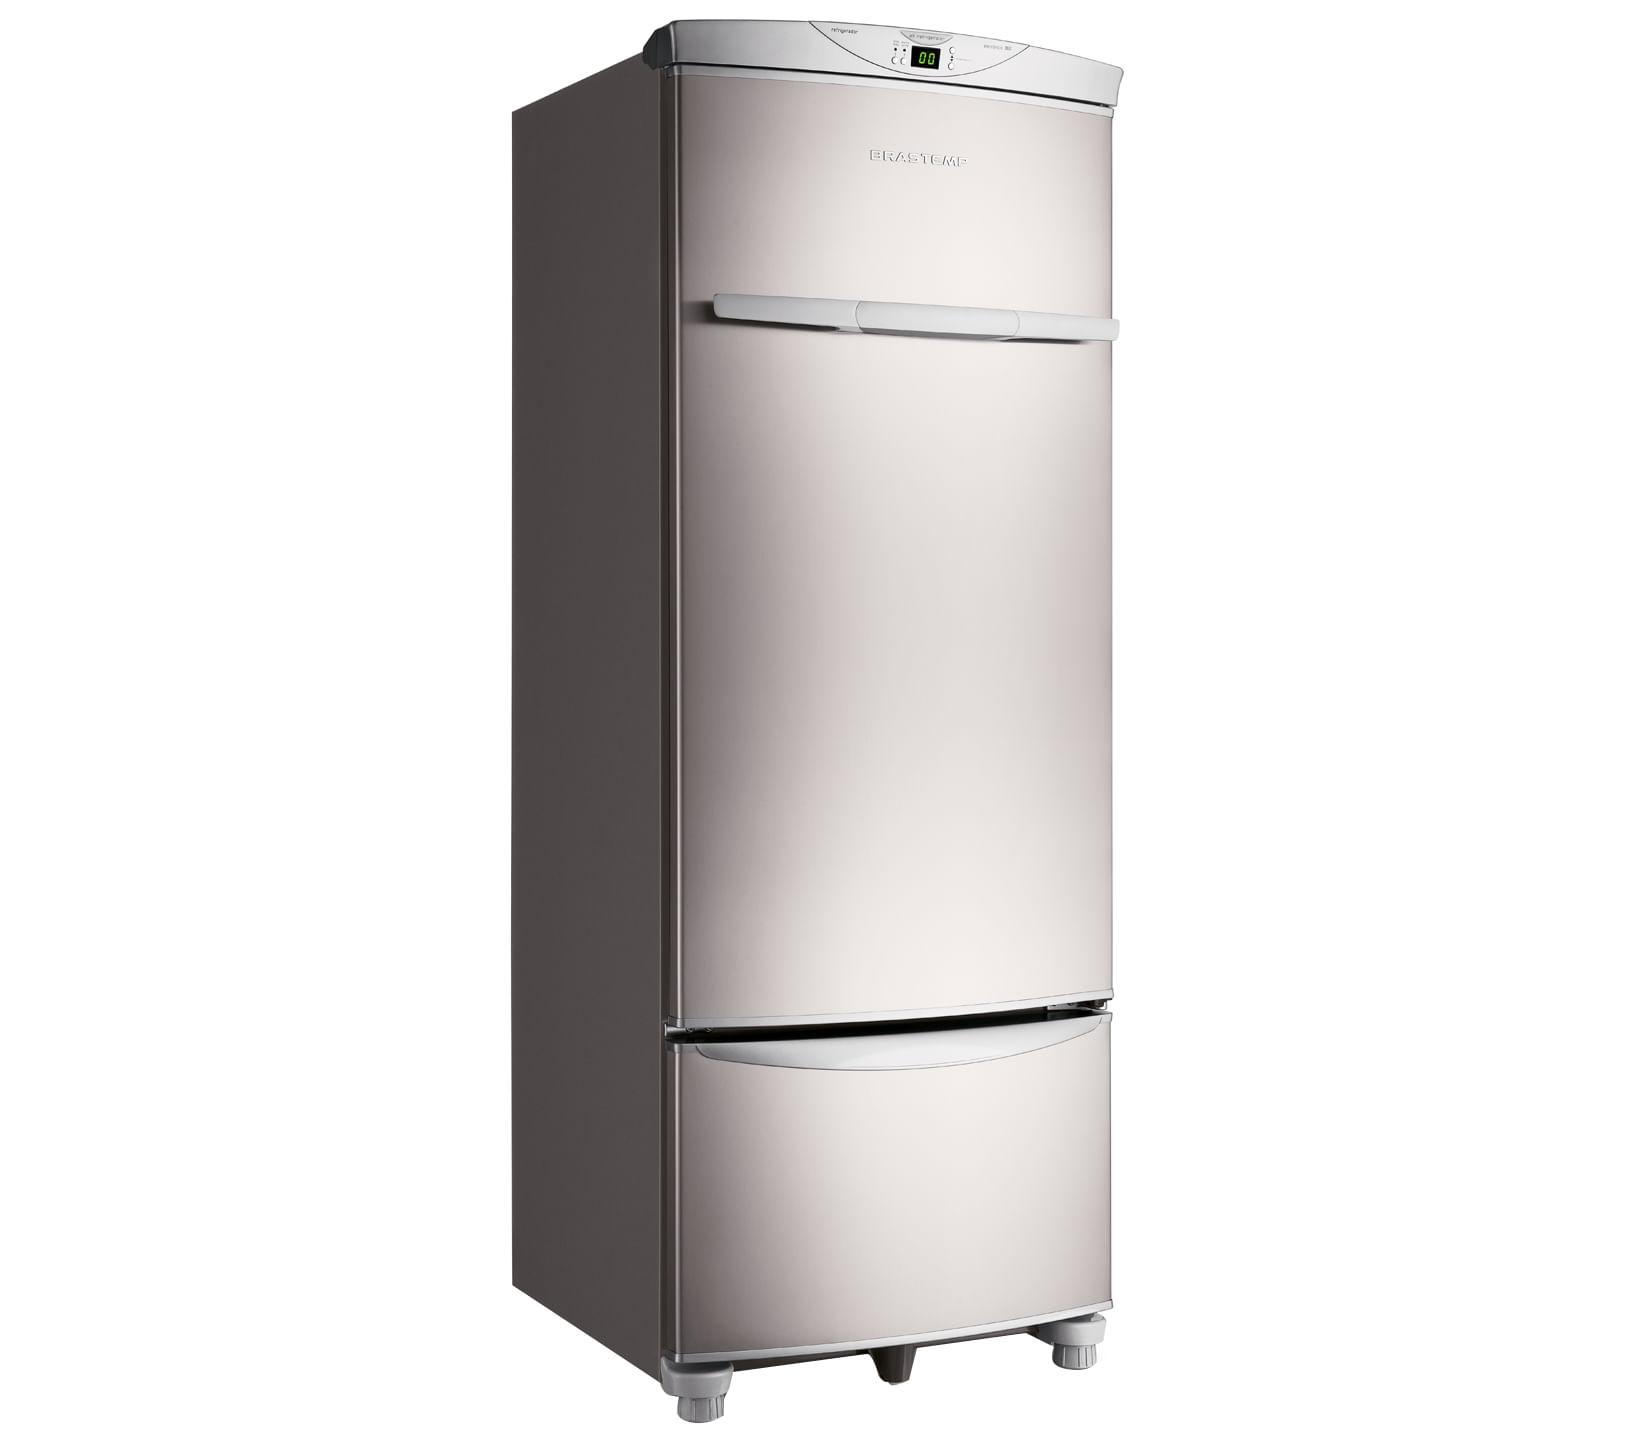 Geladeira Brastemp All Refrigerator Frost Free 330 Litros